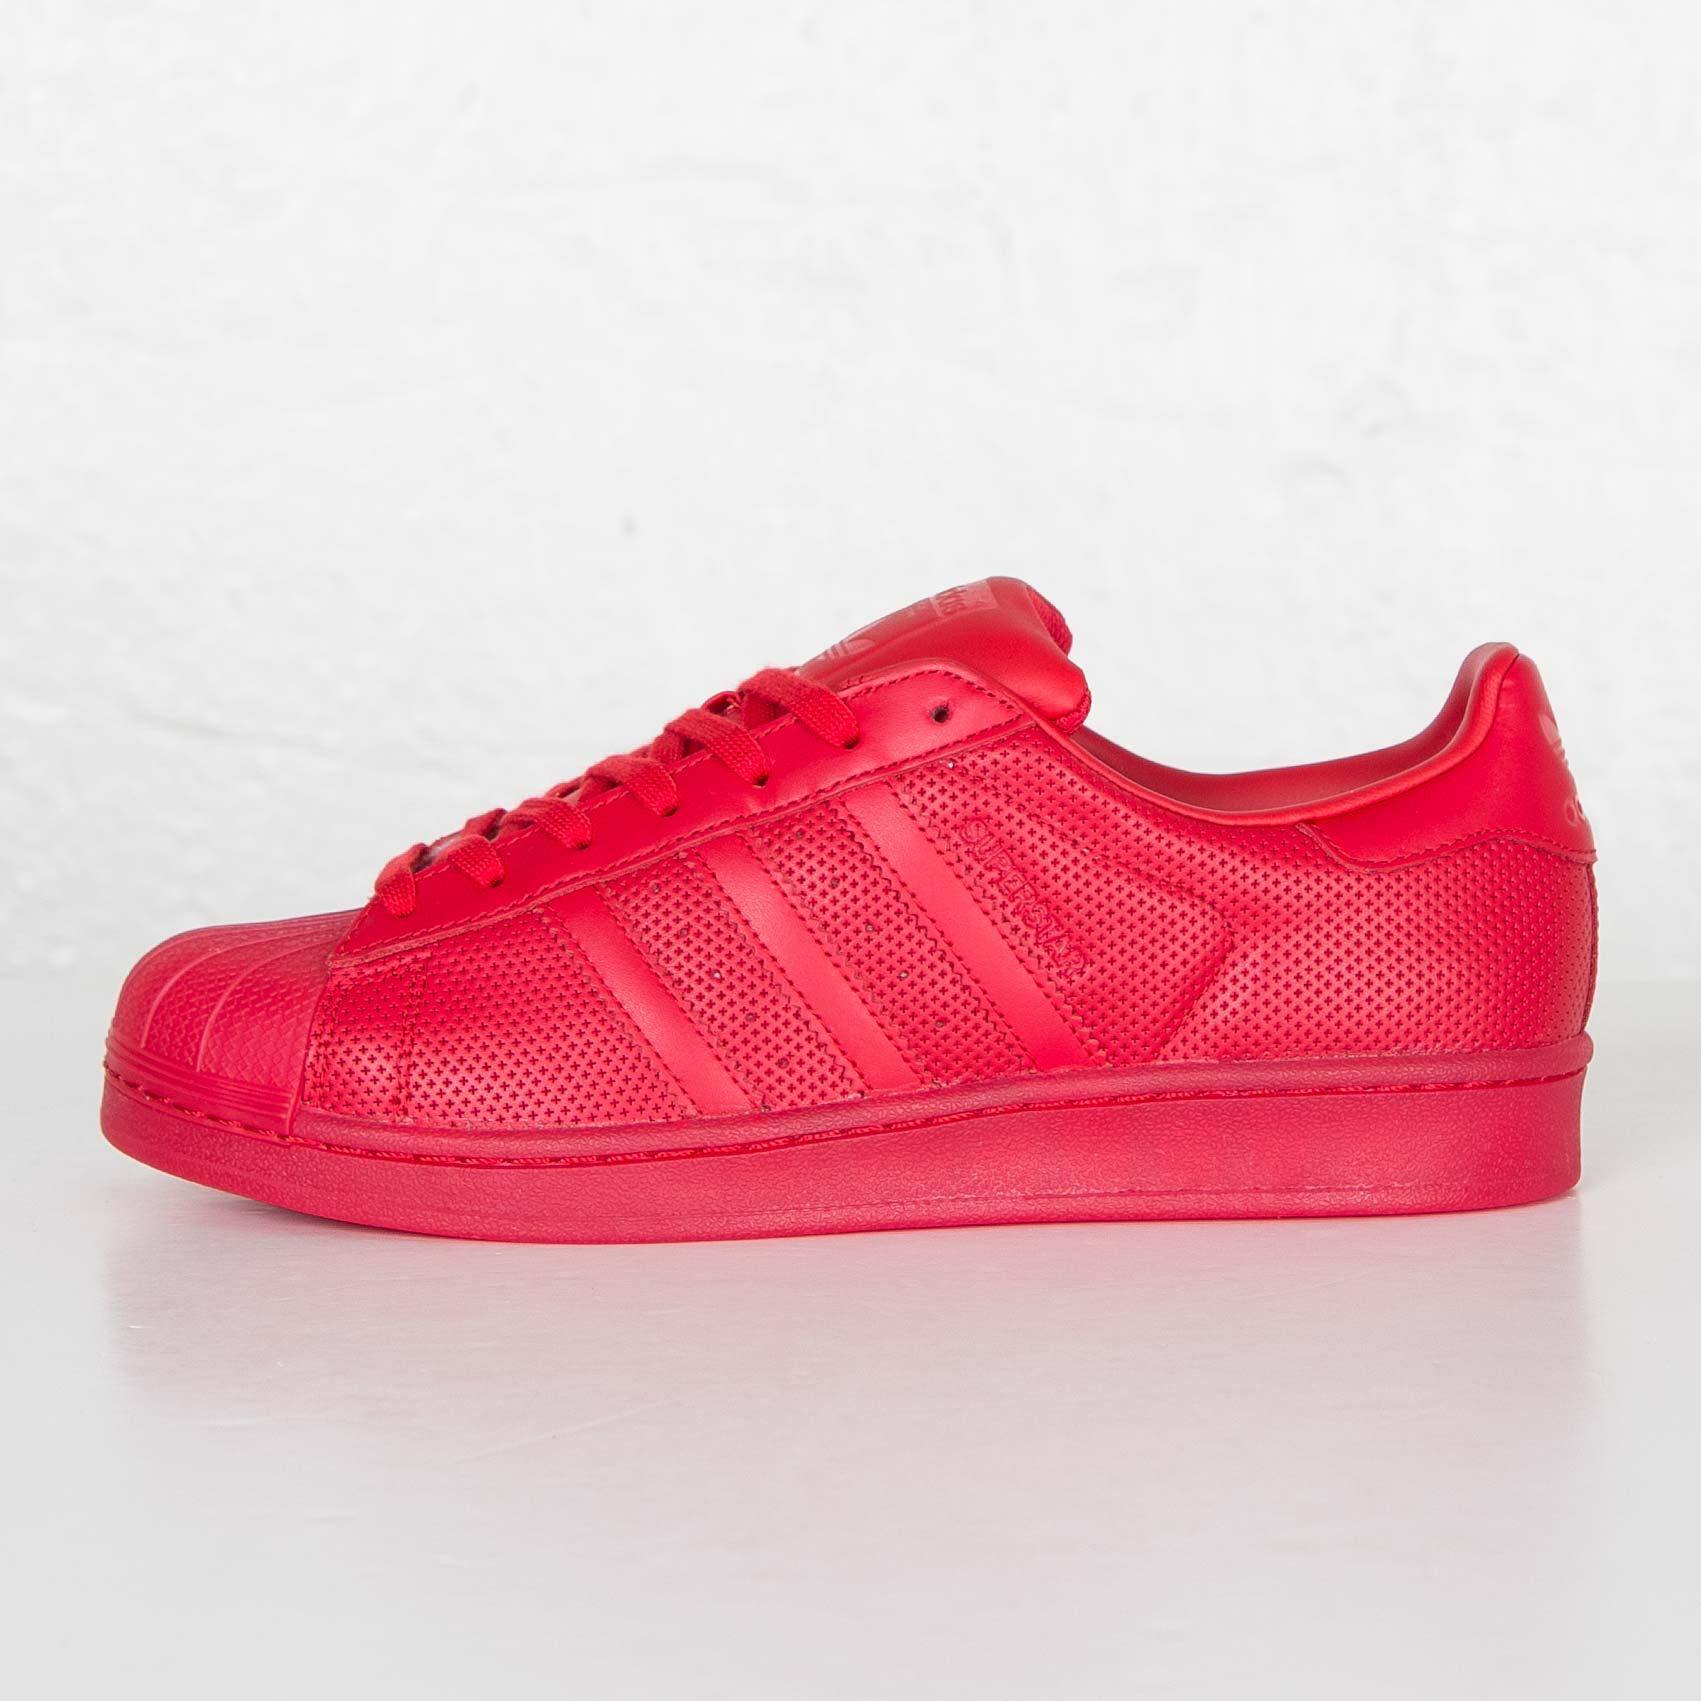 Adidas Superstar S80326 Scarpe & da Ginnasticanstuff Scarpe & Scarpe Streetwear 96a8aa